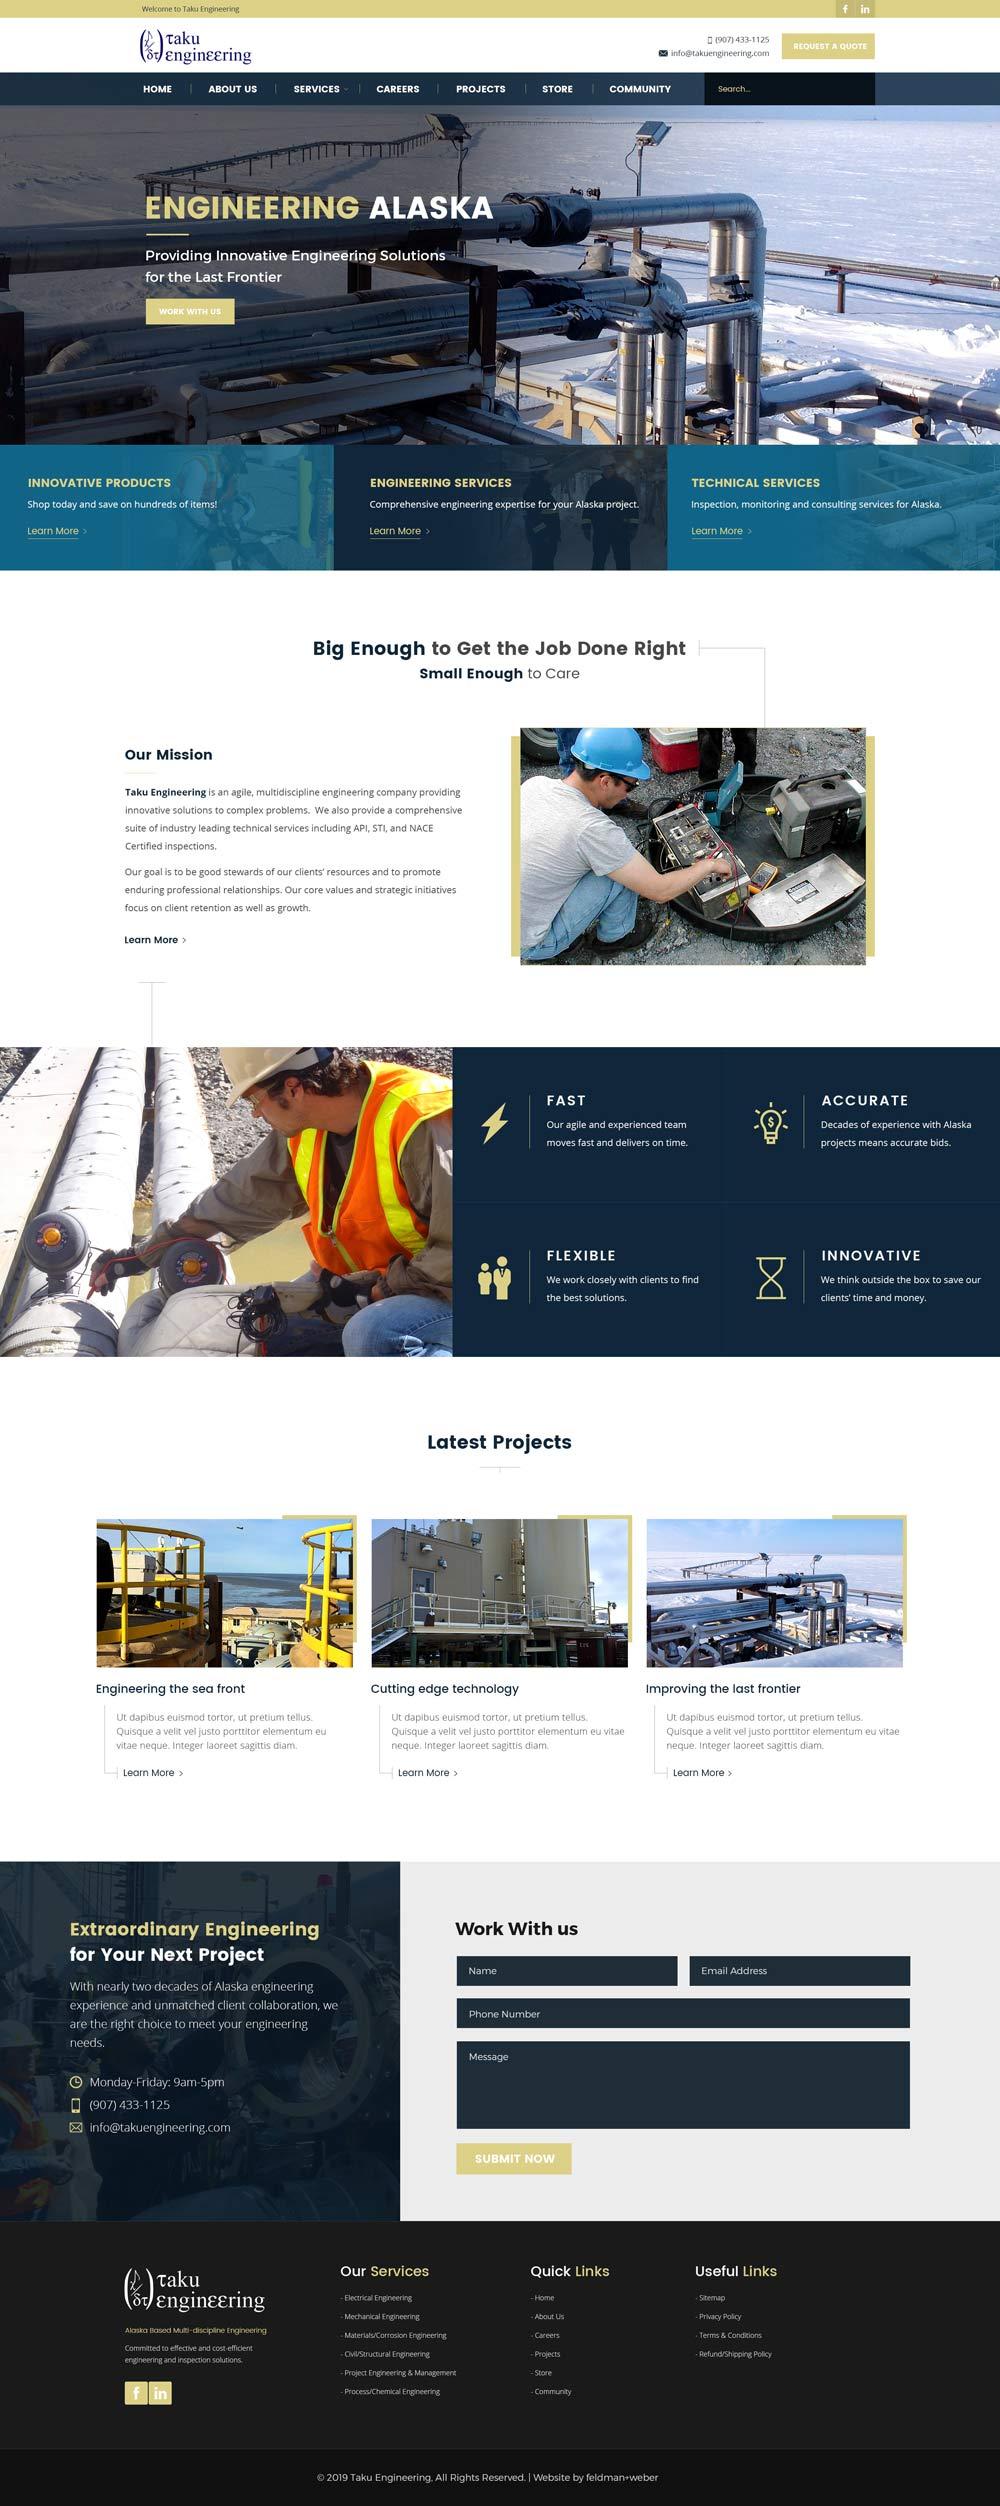 Taku Homepage